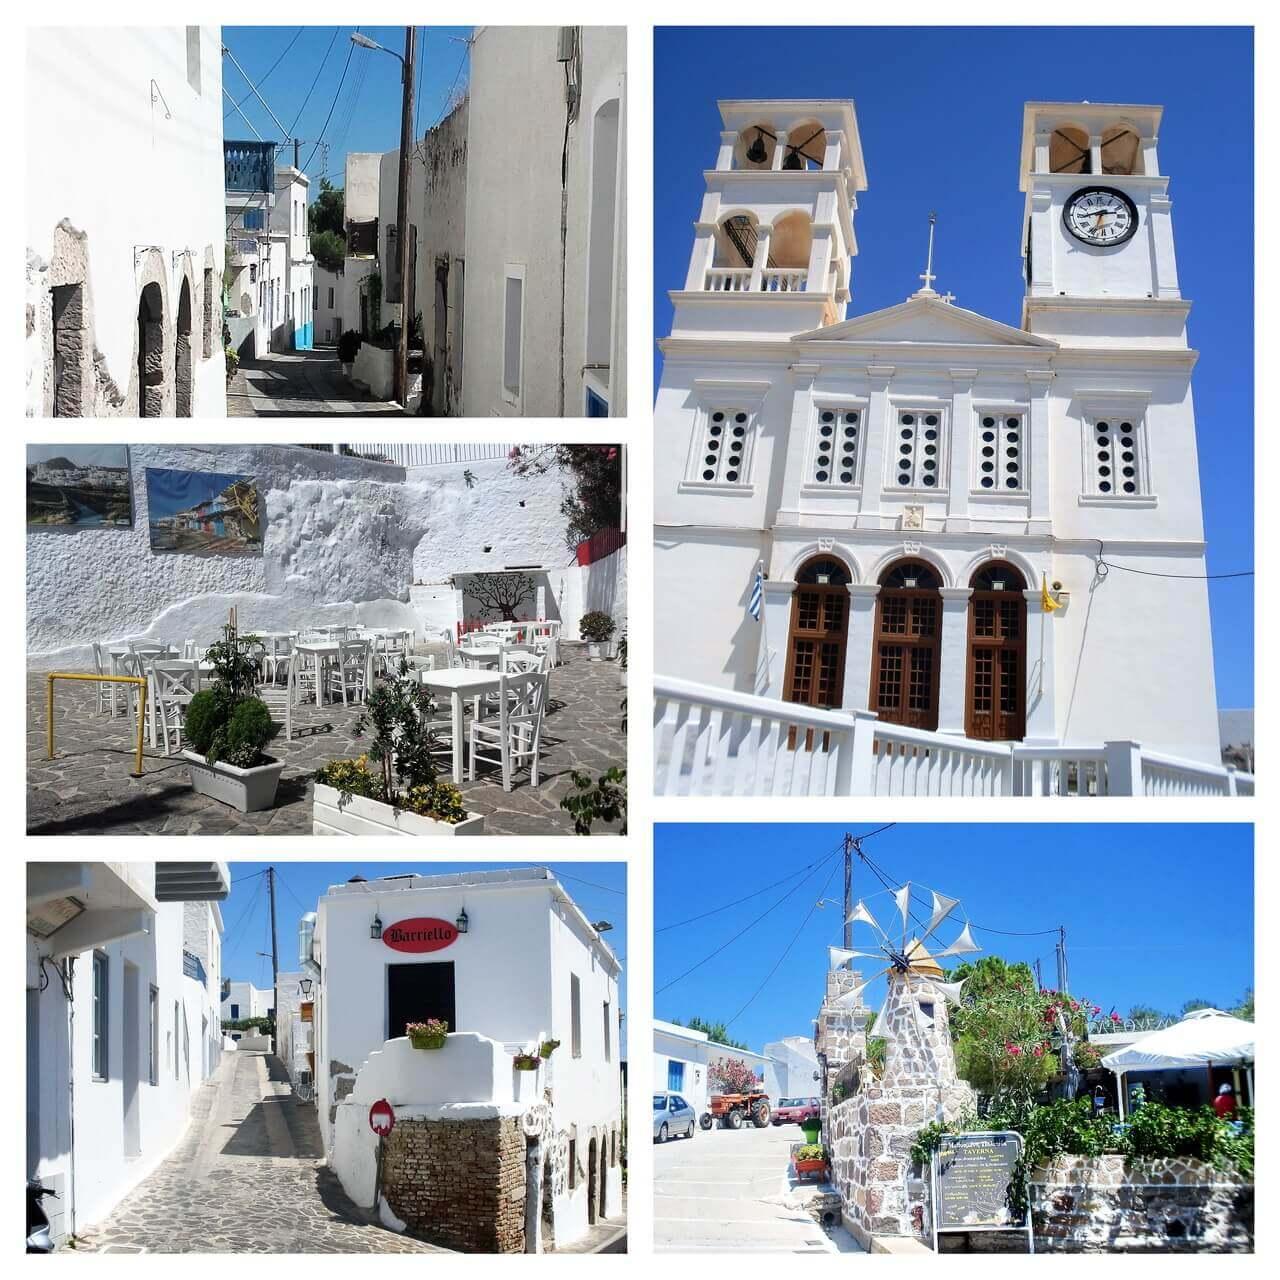 Trypiti church and restaurants